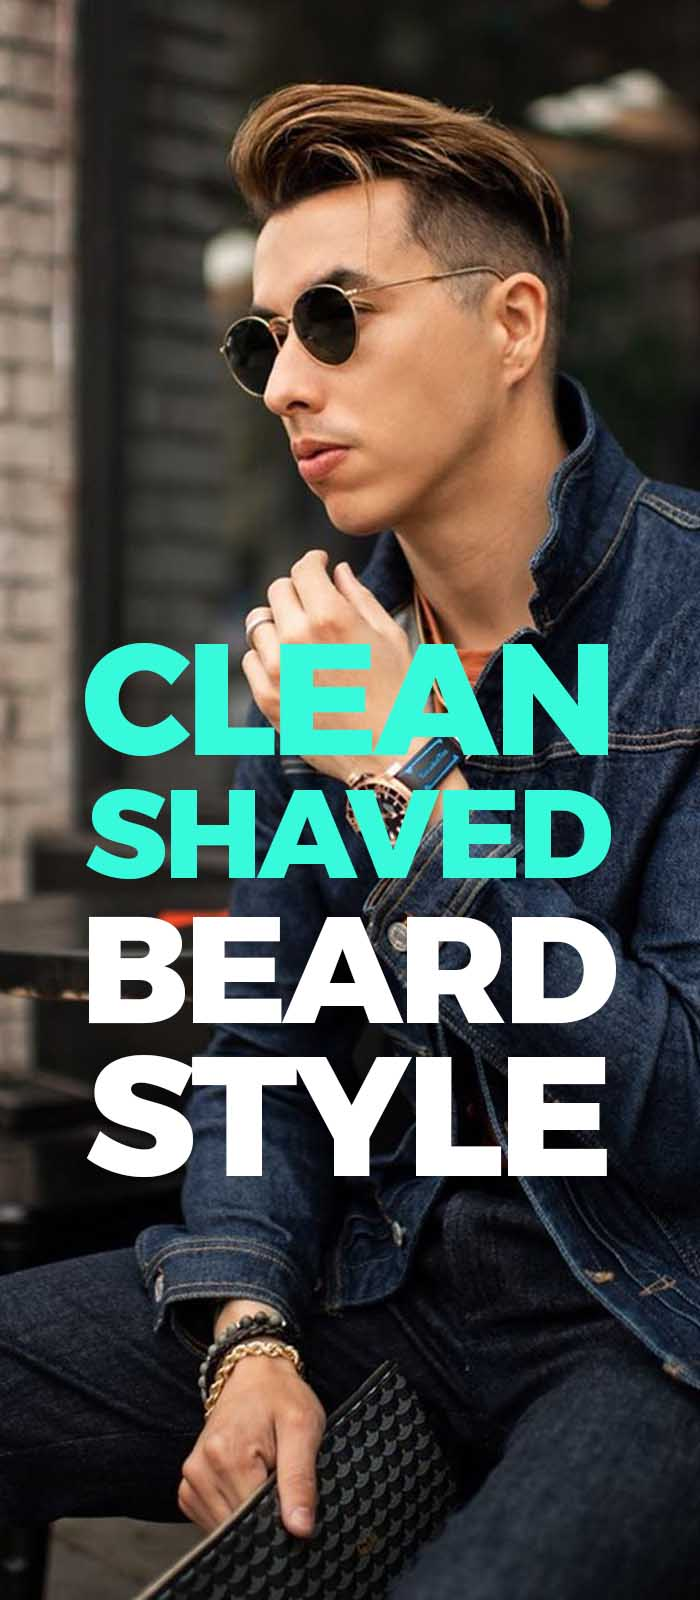 Clean shaved beard for men!